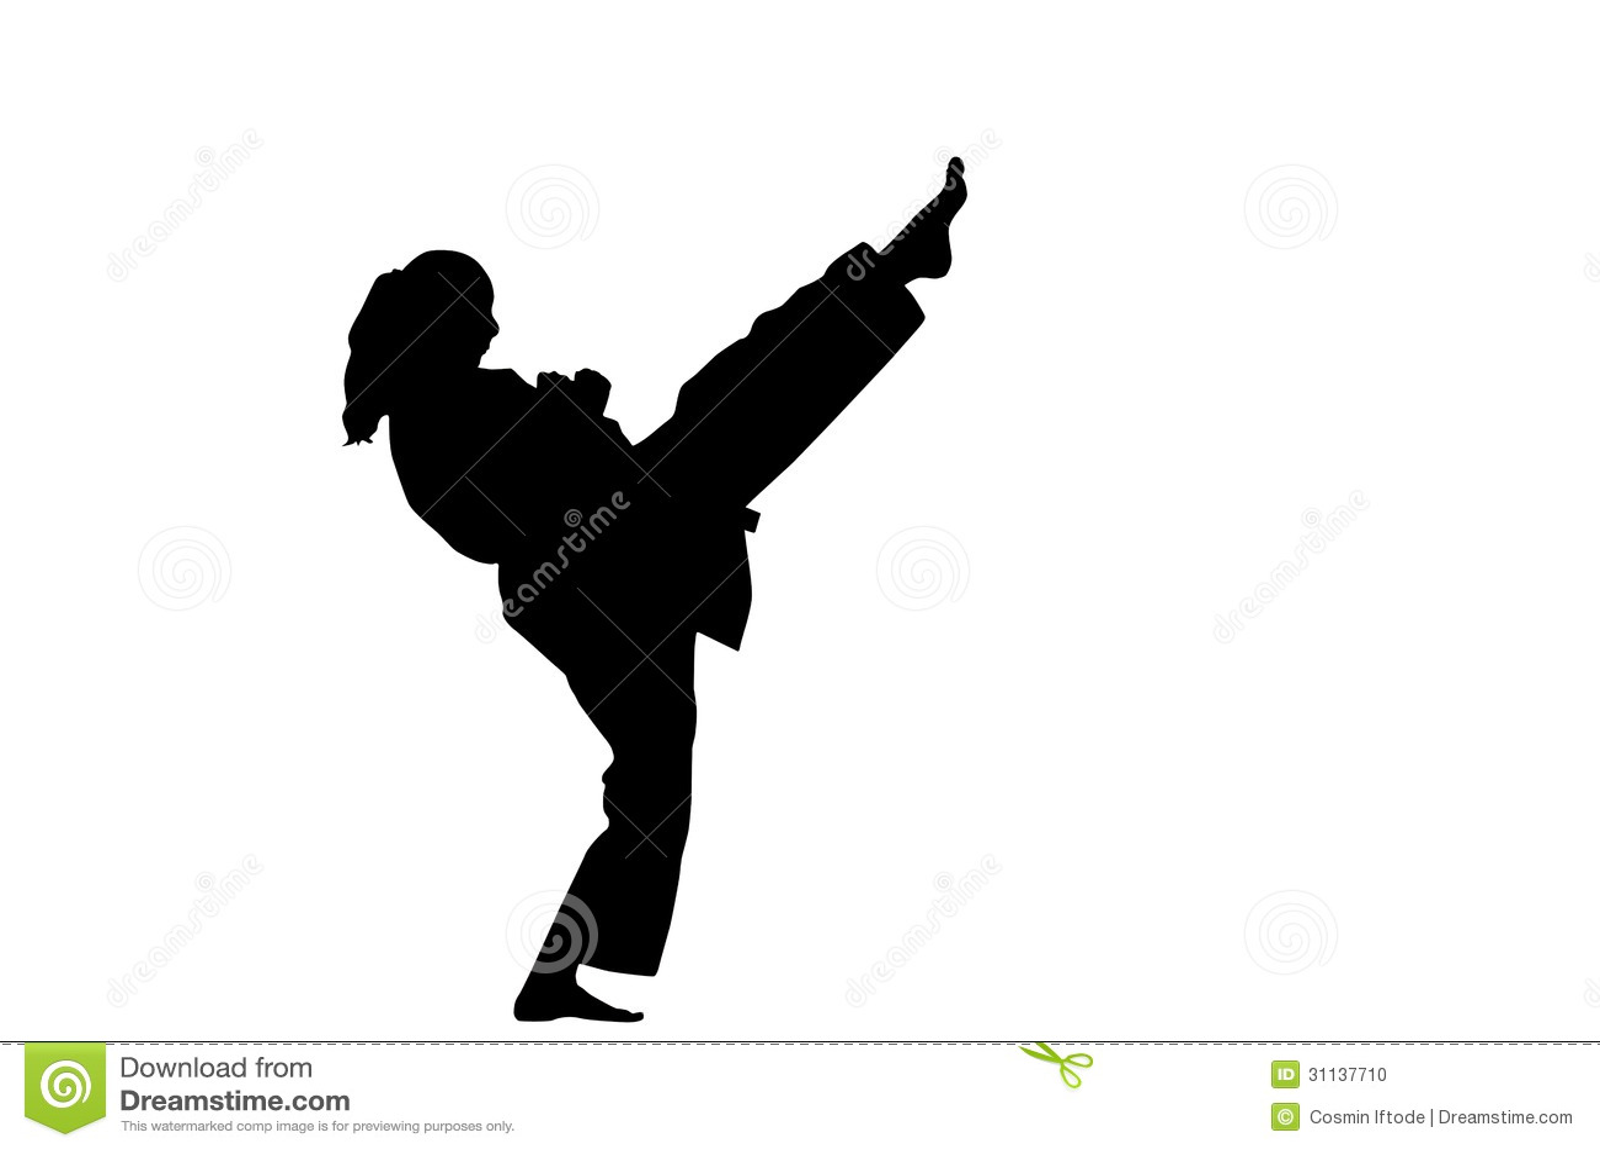 bruce lee flying kick wallpaper